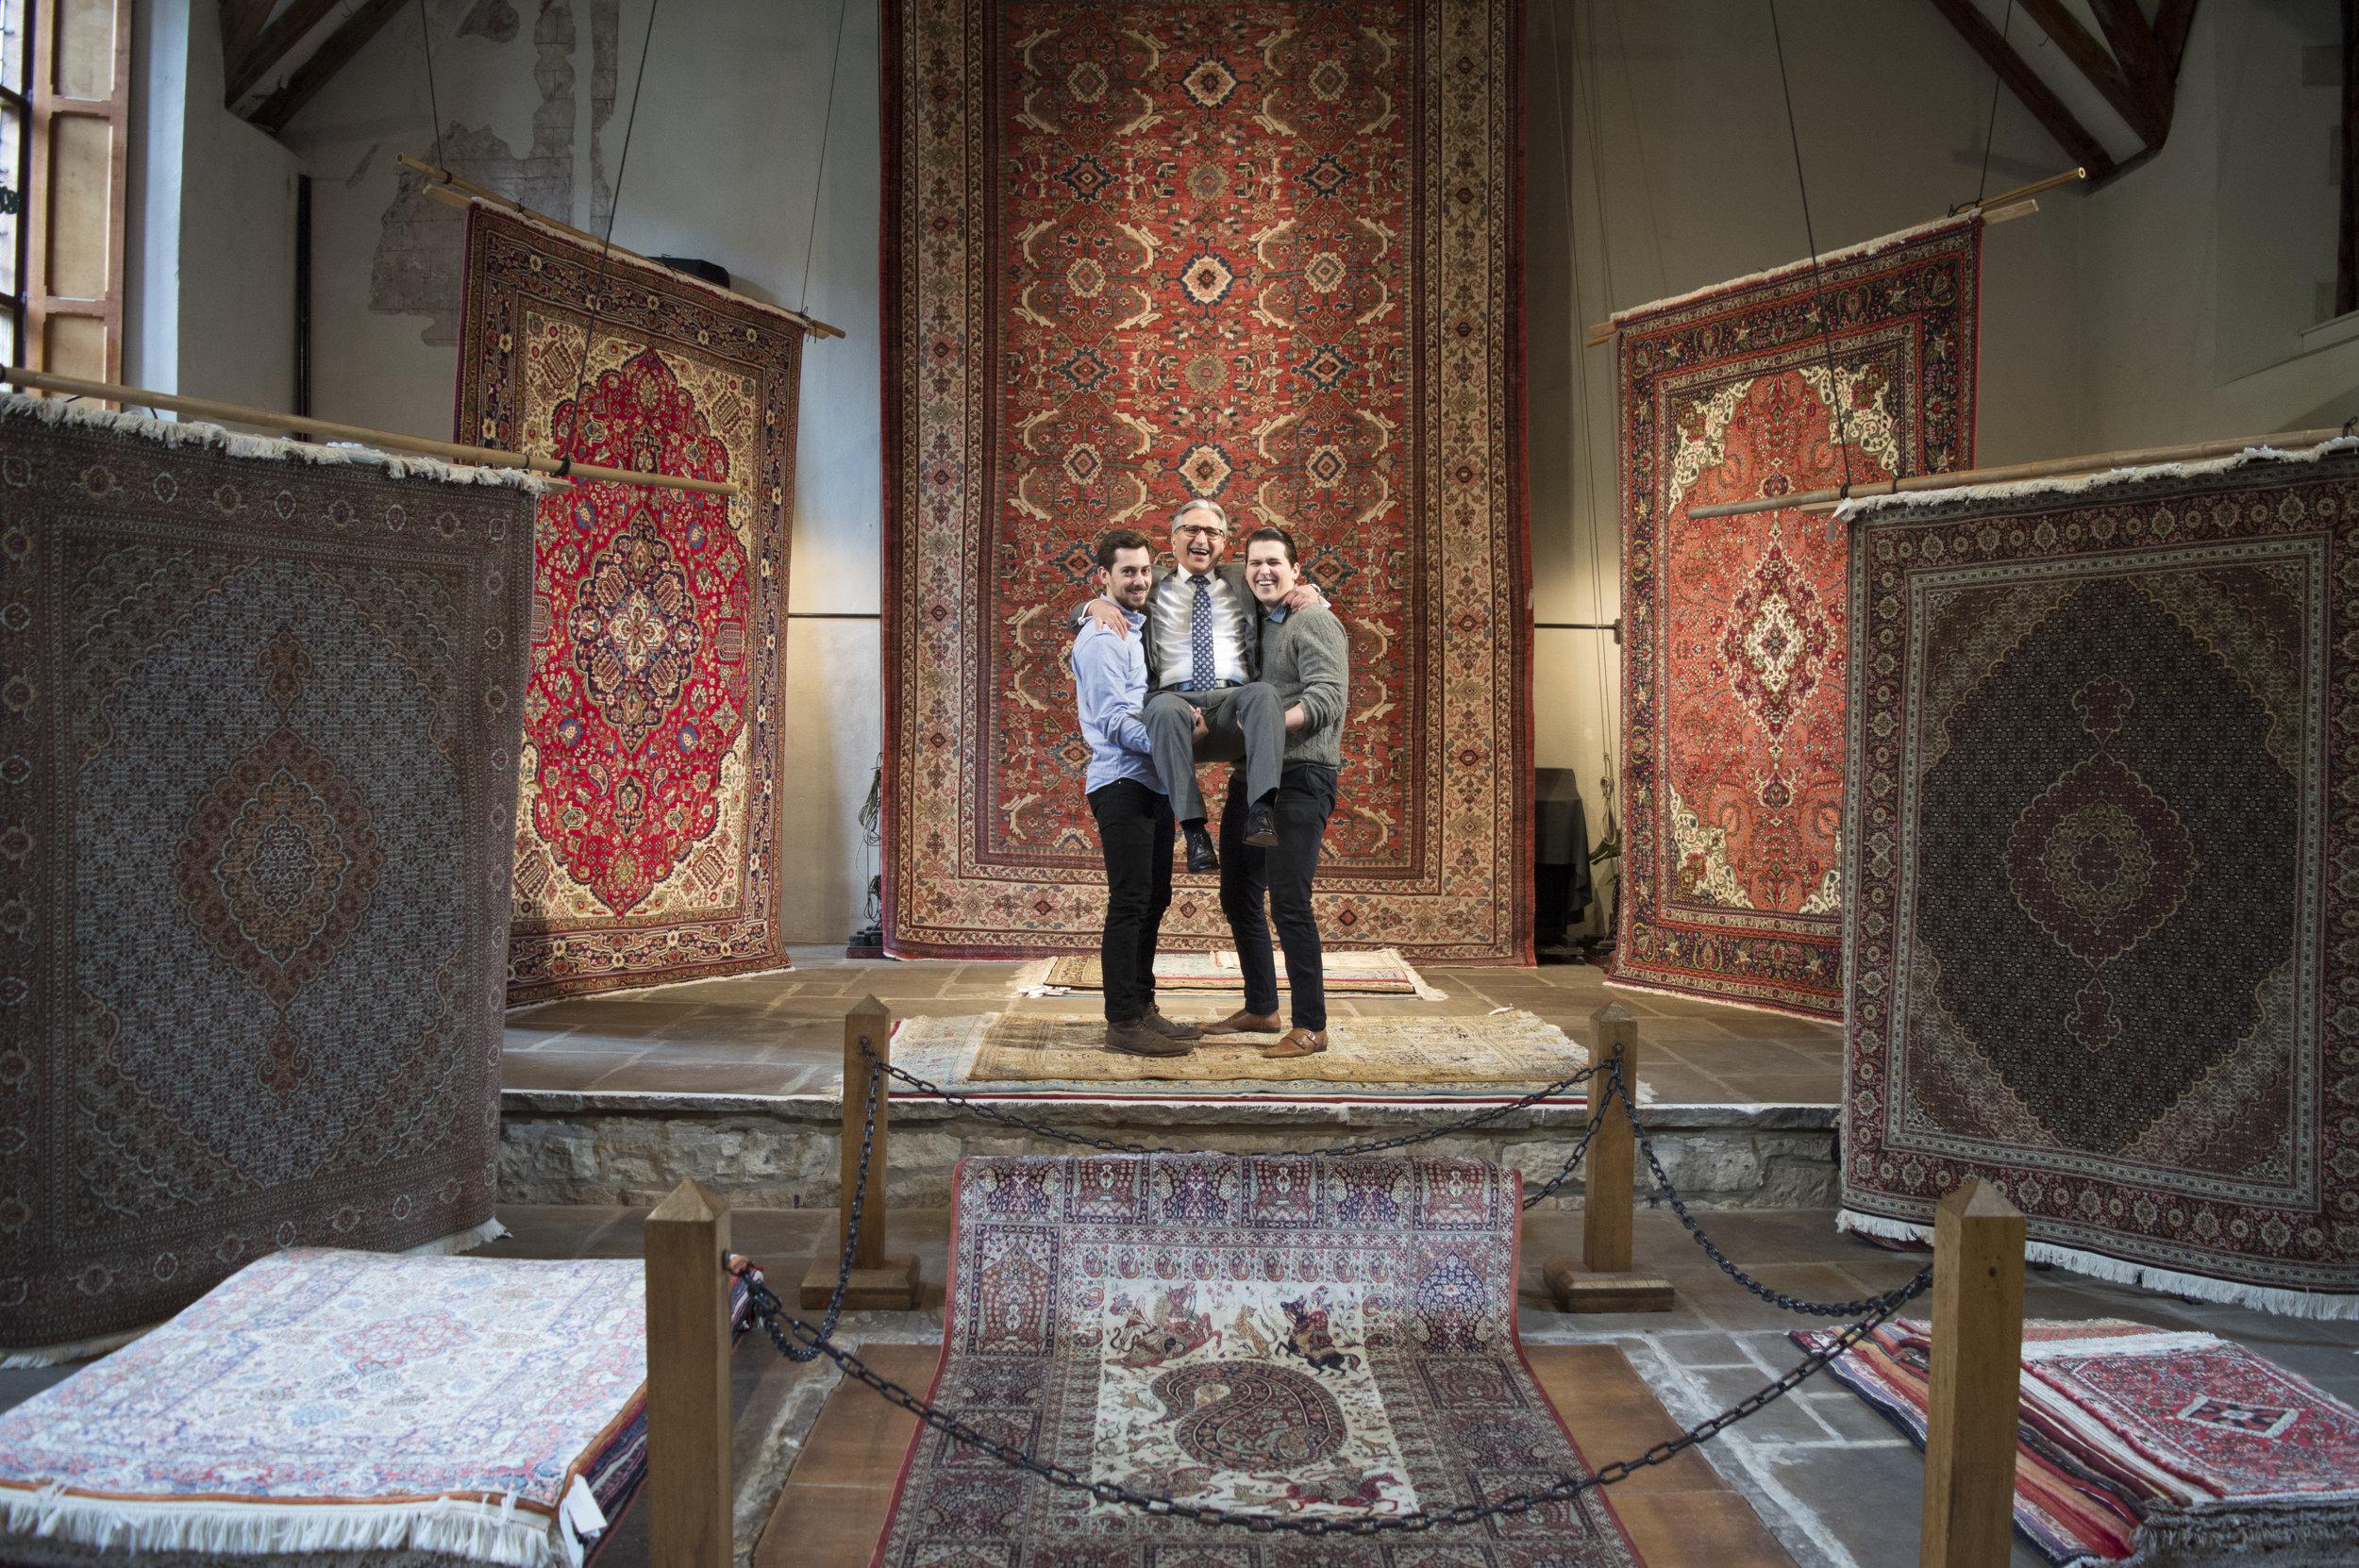 Salisbury, Persian Rug, Persian Carpet, Rug, Hampshire, Bakhtiyar, Medieval Hall, Persian Rug Hampshire, Persian Rug Wiltshire, Wiltshire